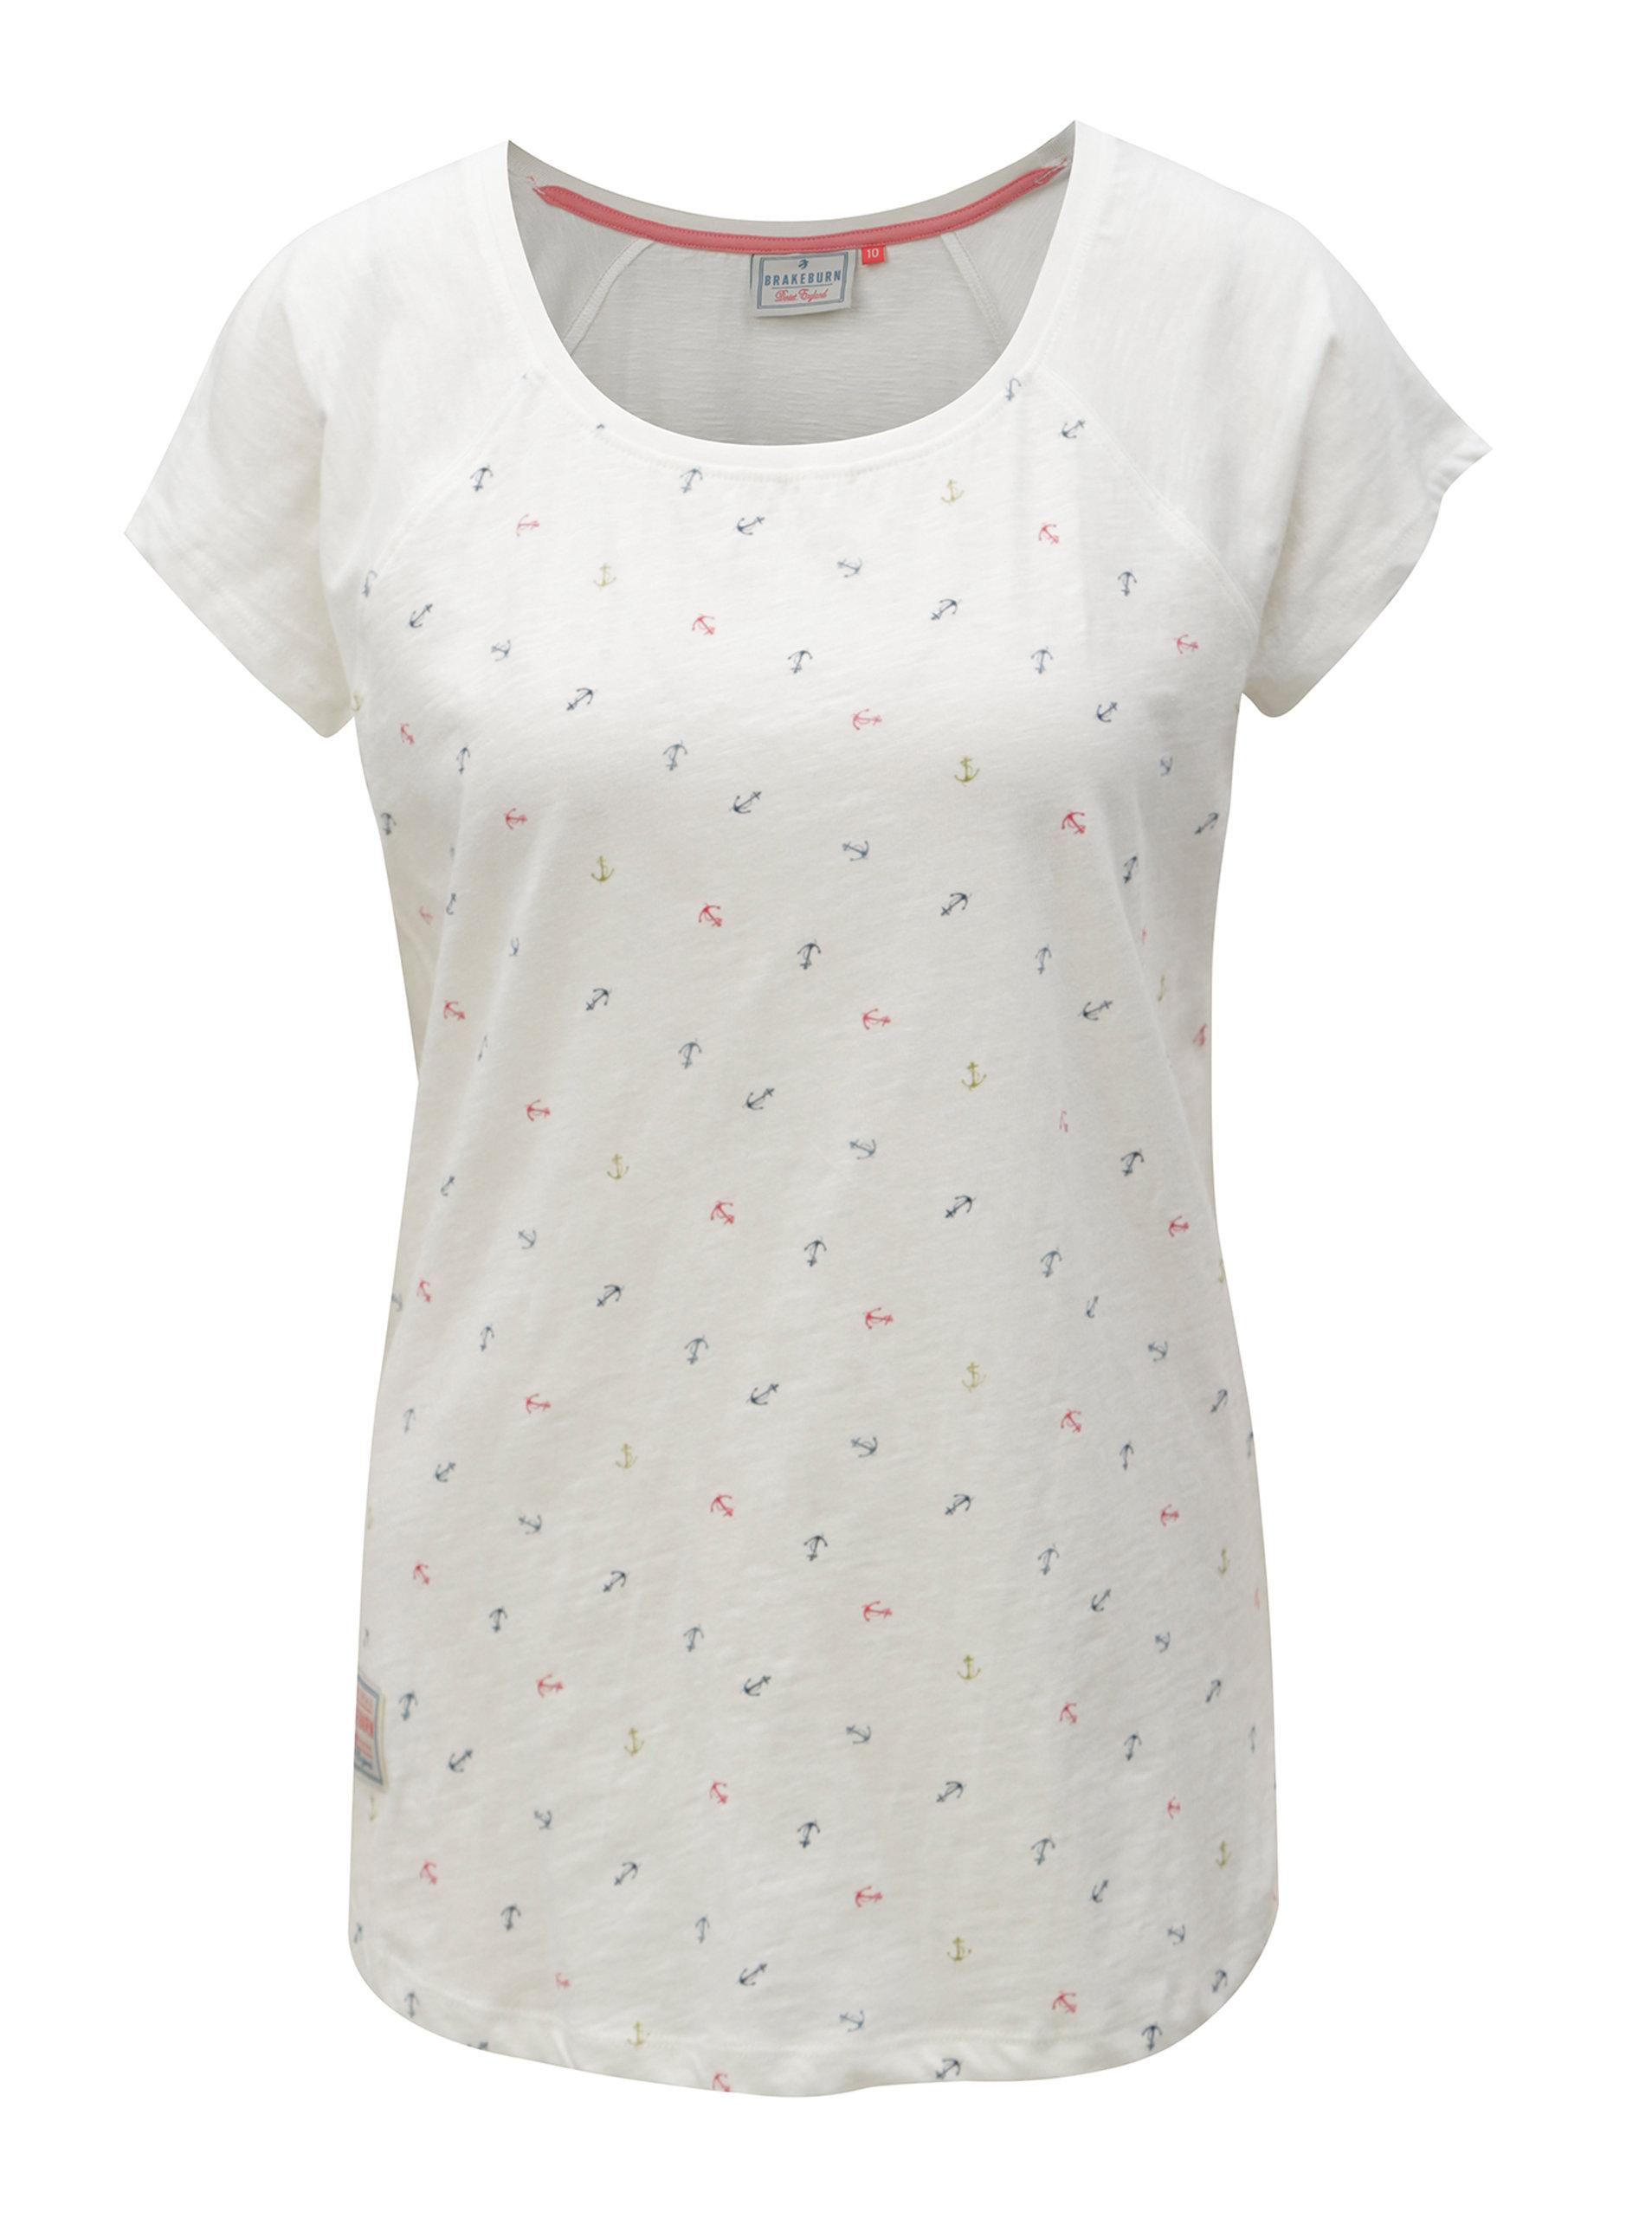 Bílé tričko s motivem kotev Brakeburn ... 8304e5abfd